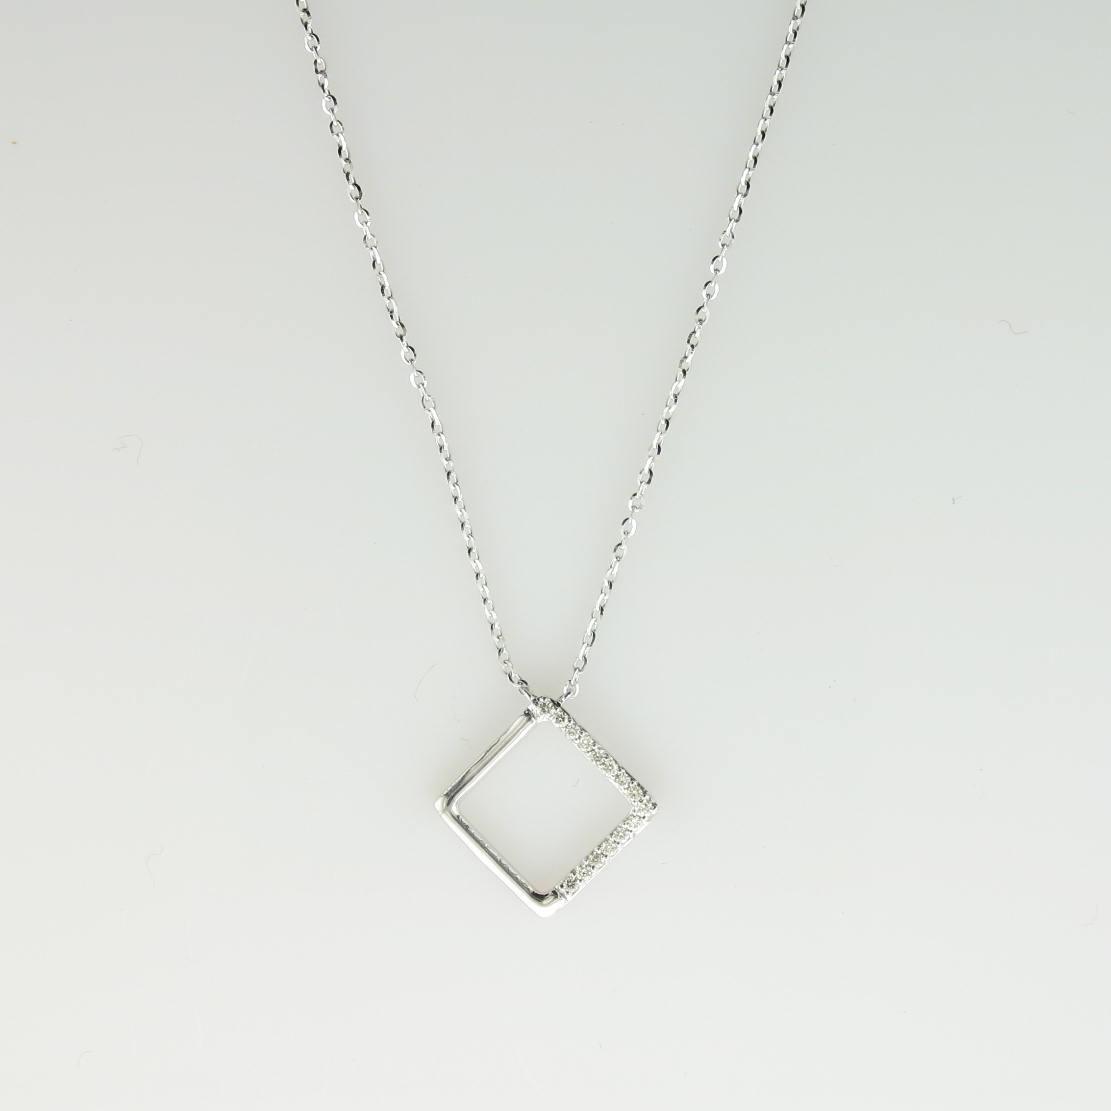 0.06tcw Diamond Shaped Diamond Necklace set in 14k White Gold